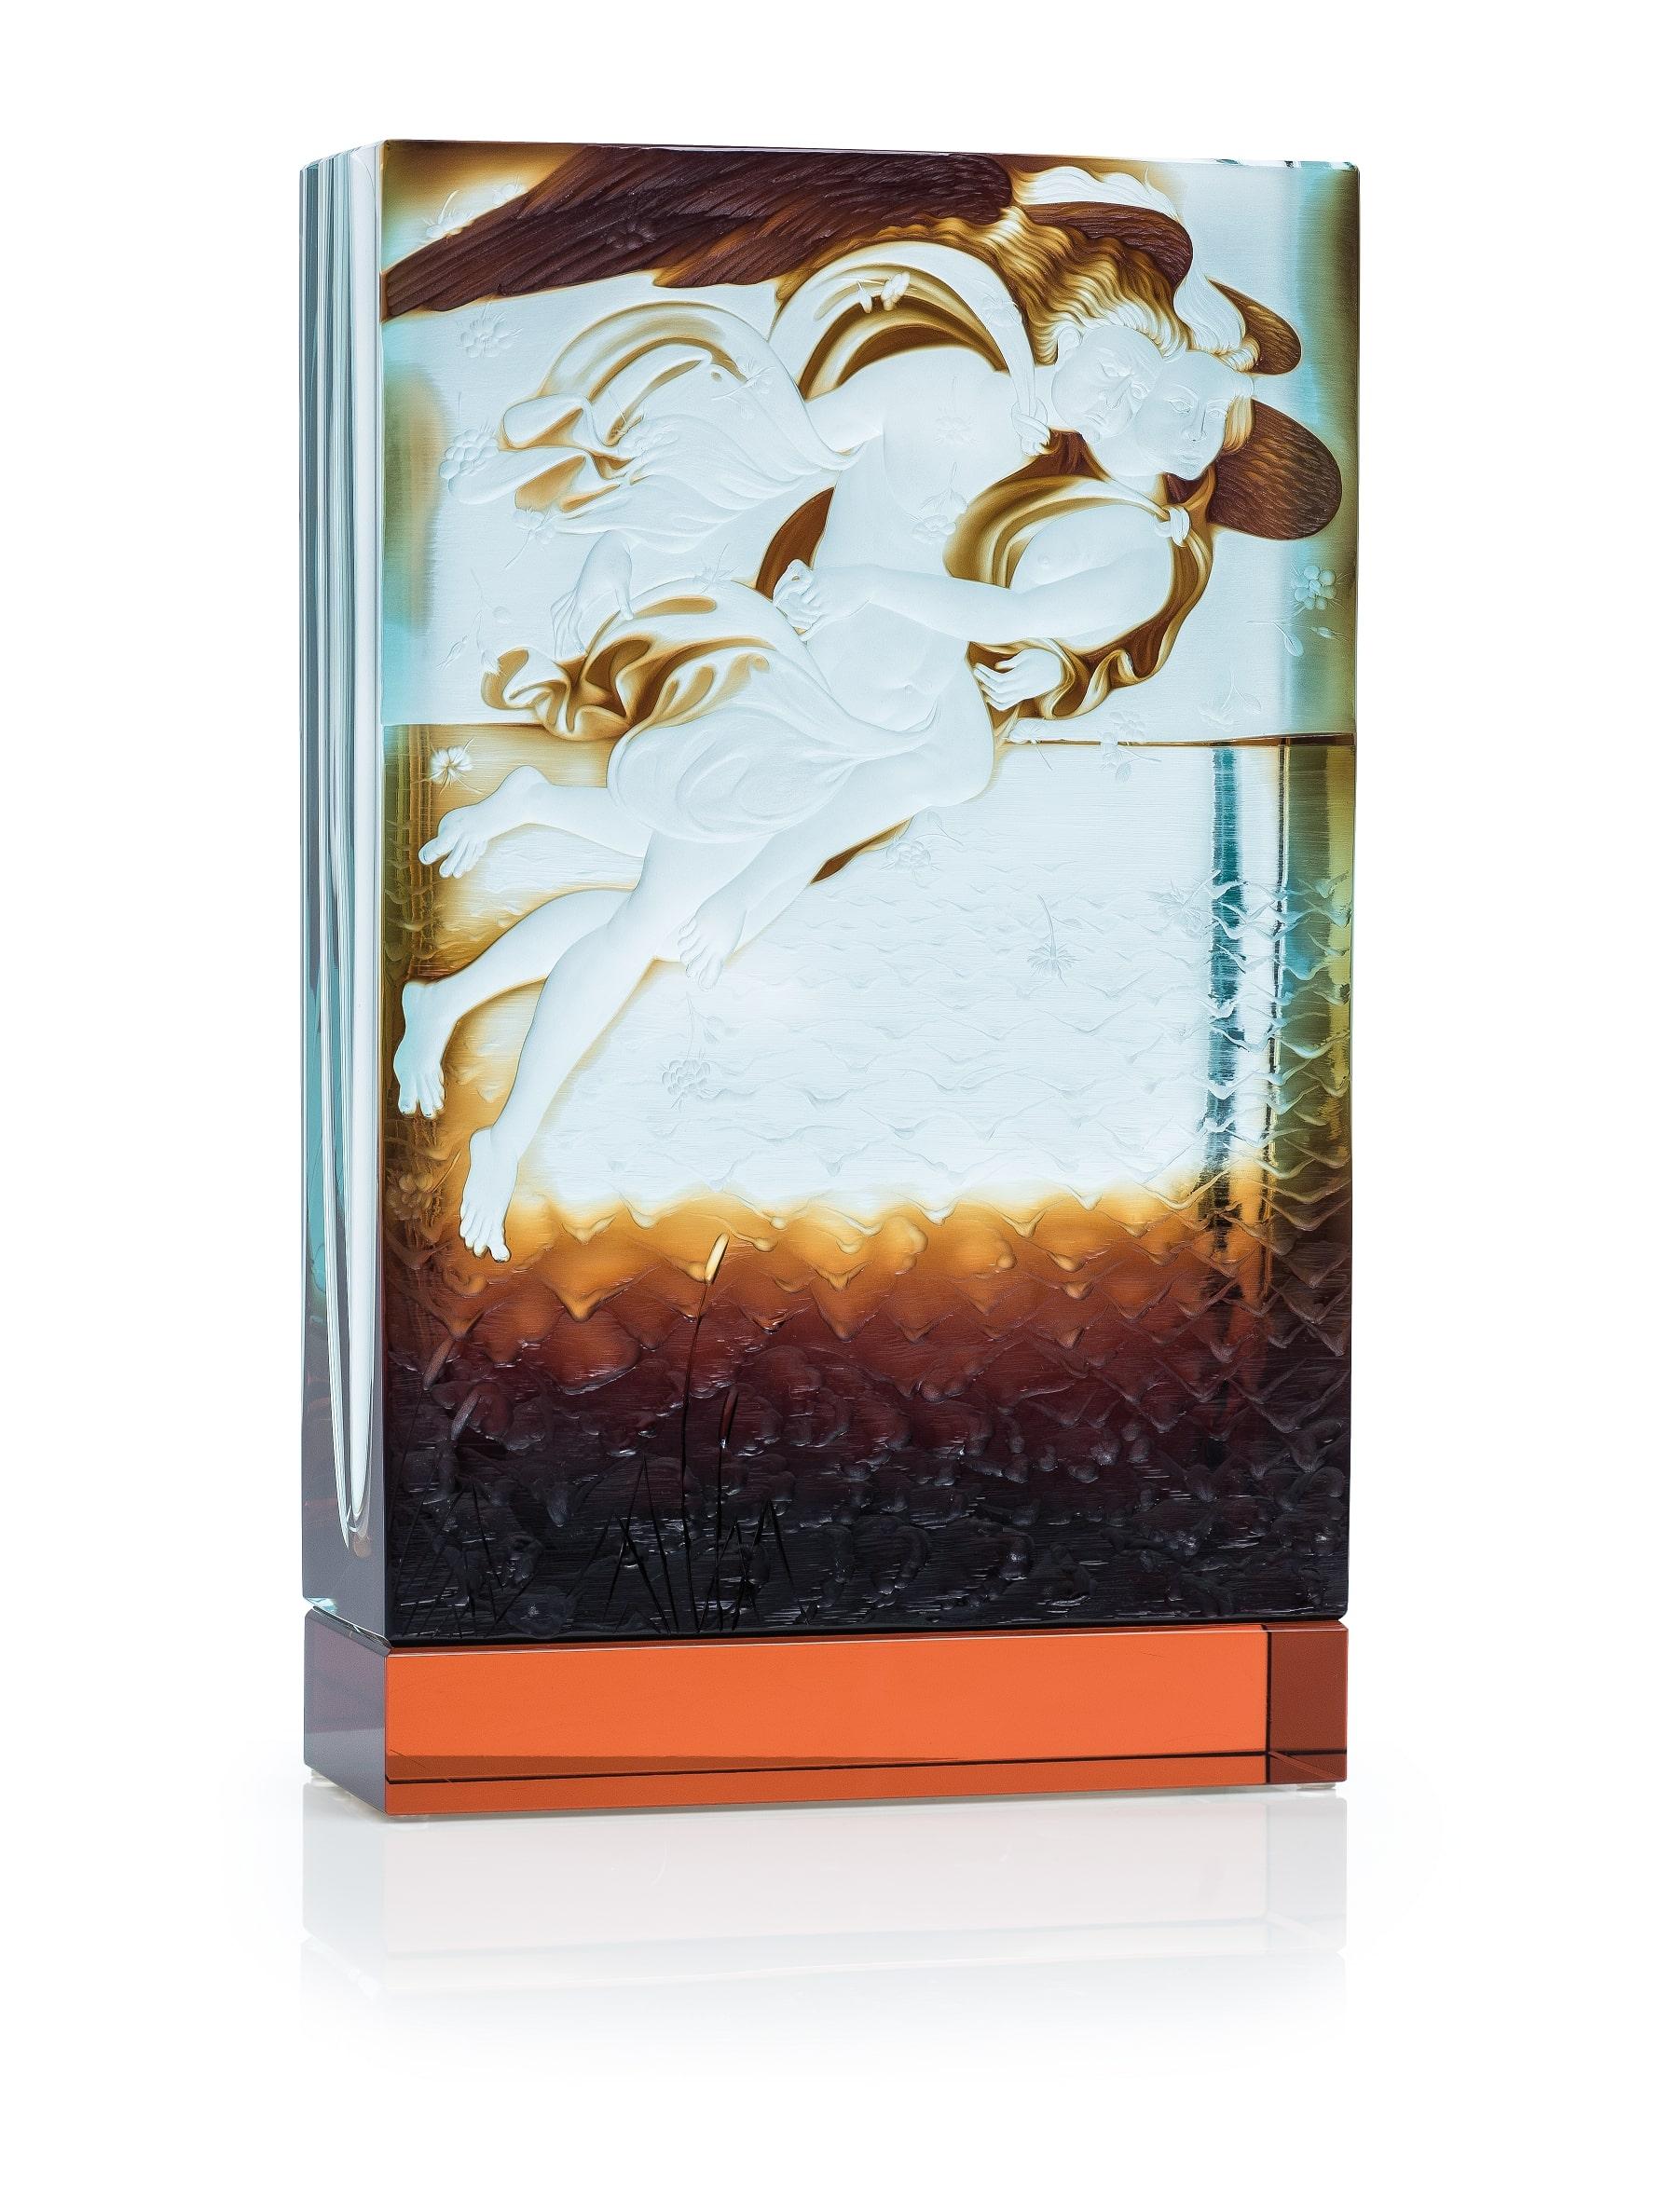 birth-of-venus-glass-art-lapolo